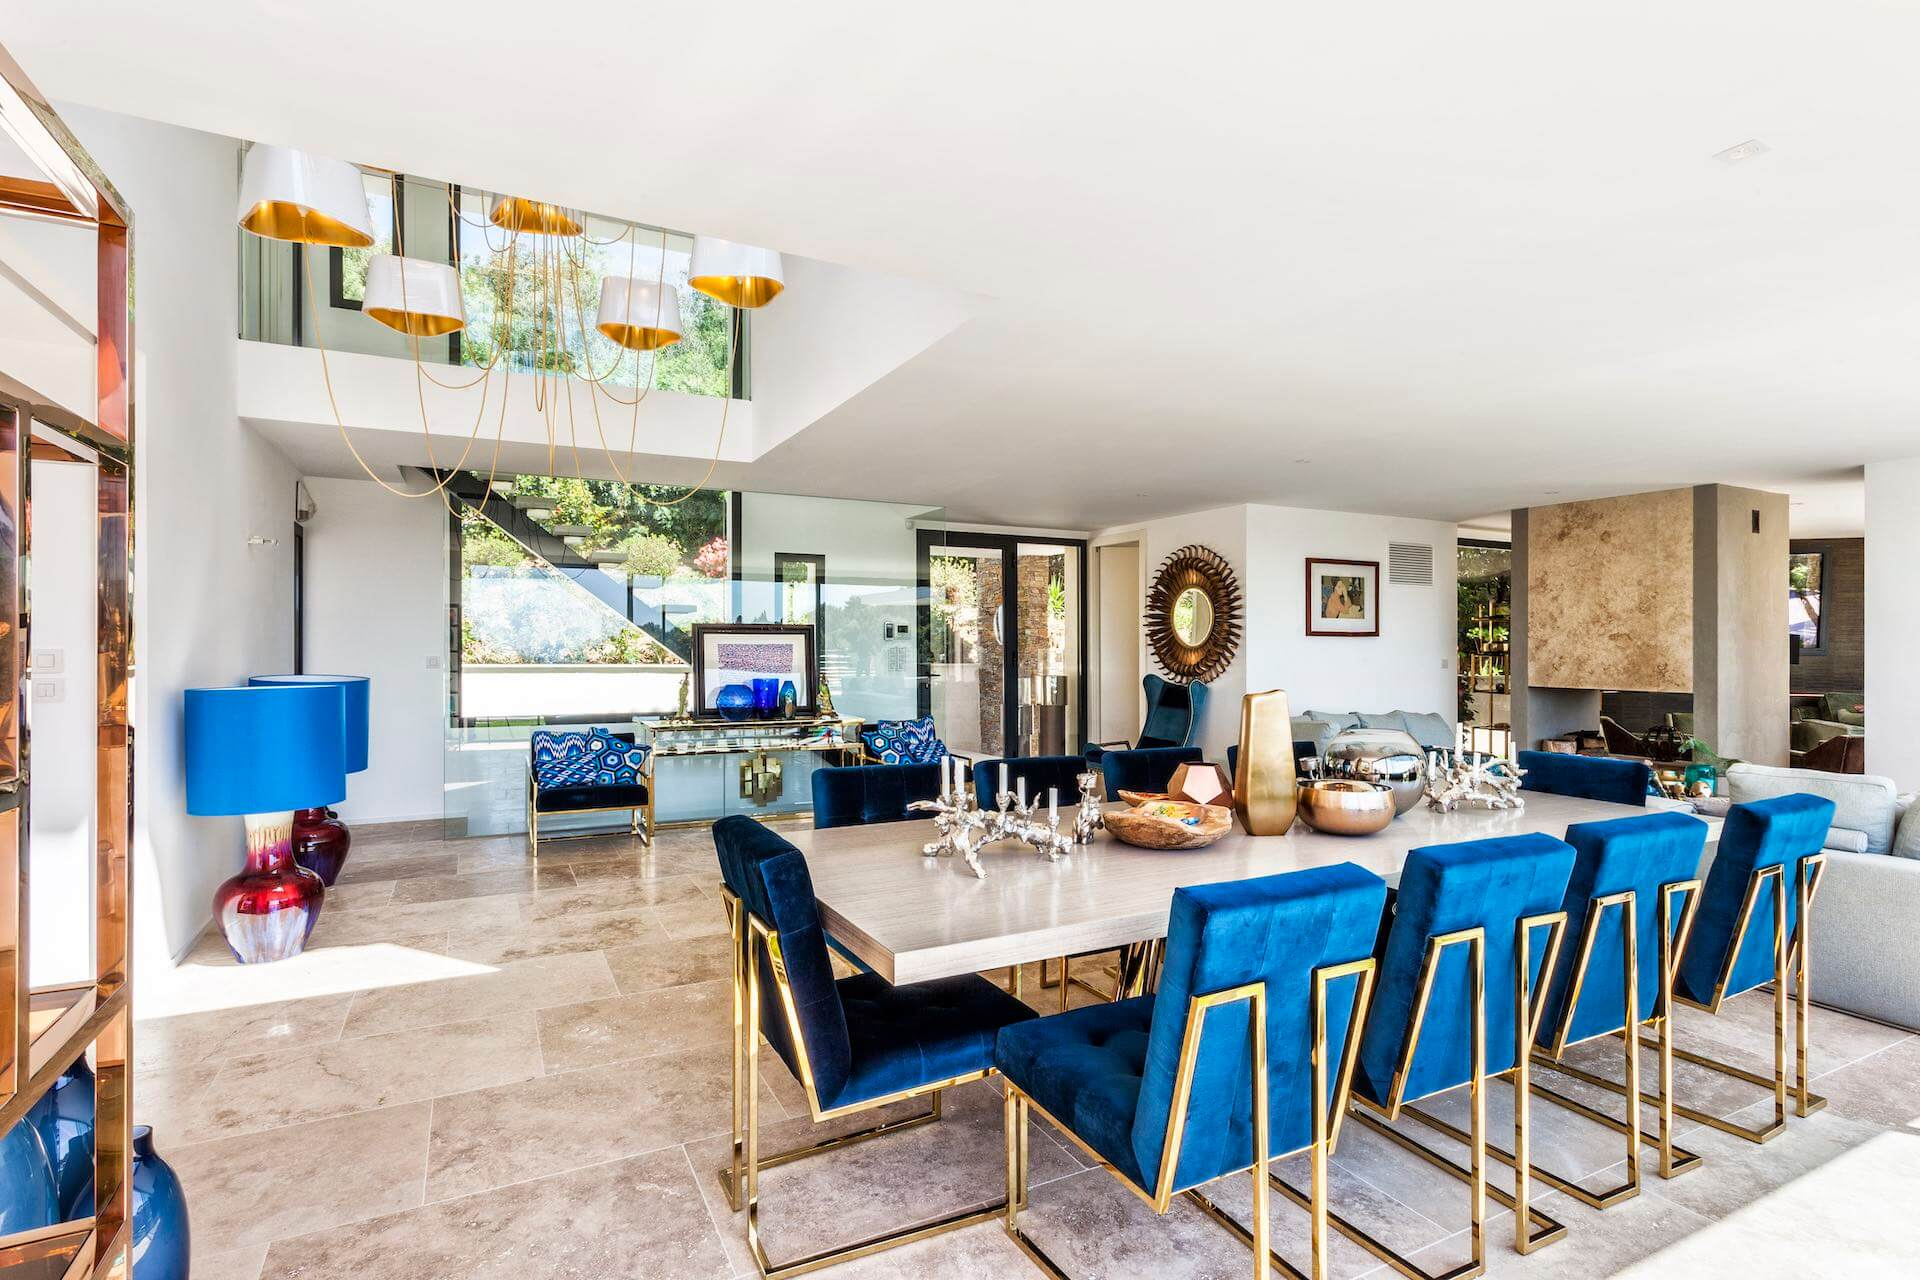 Living room of Villa Colibri